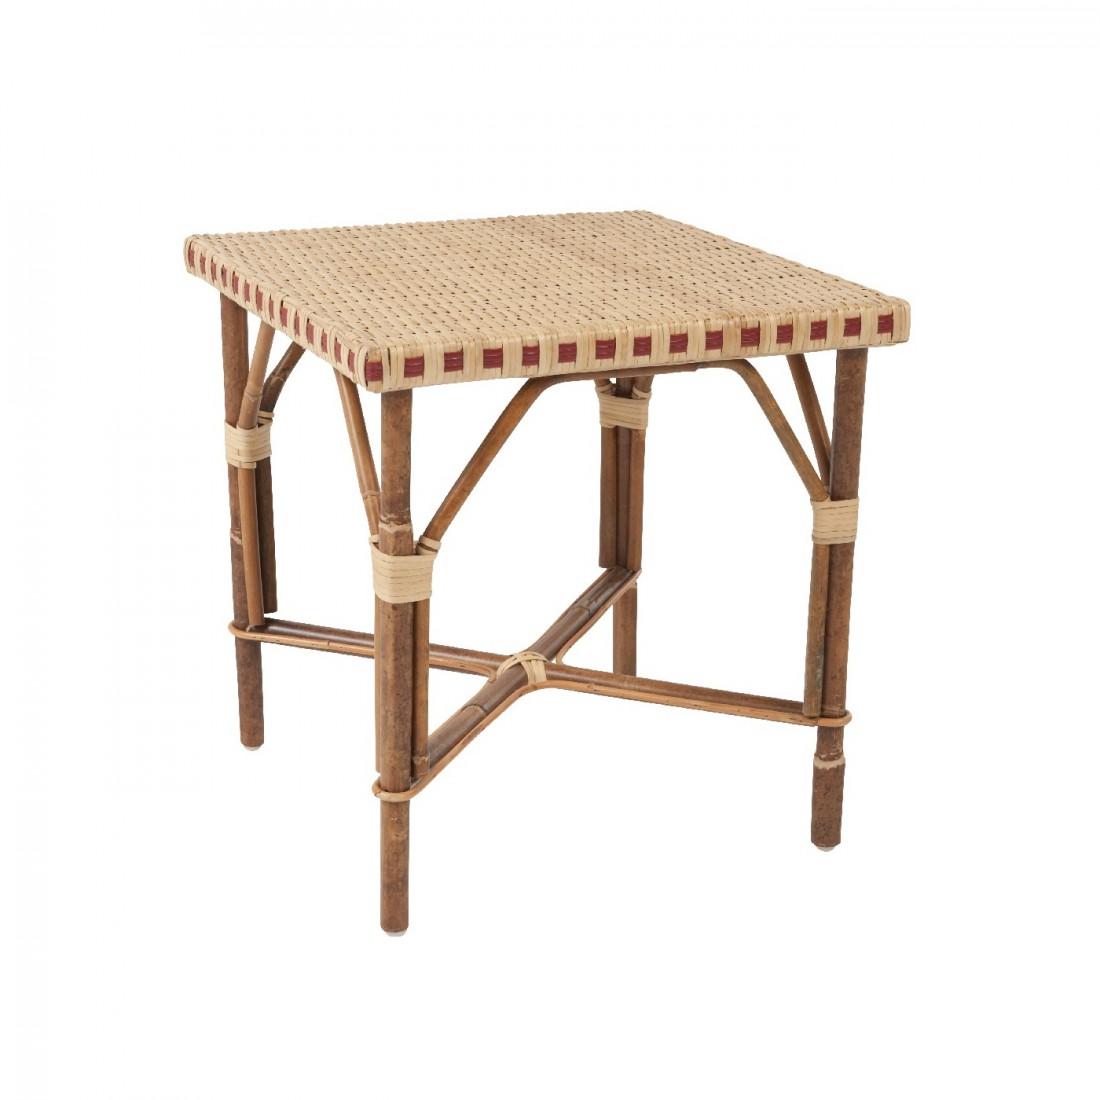 table basse en rotin bagatelle bout de canap en rotin. Black Bedroom Furniture Sets. Home Design Ideas